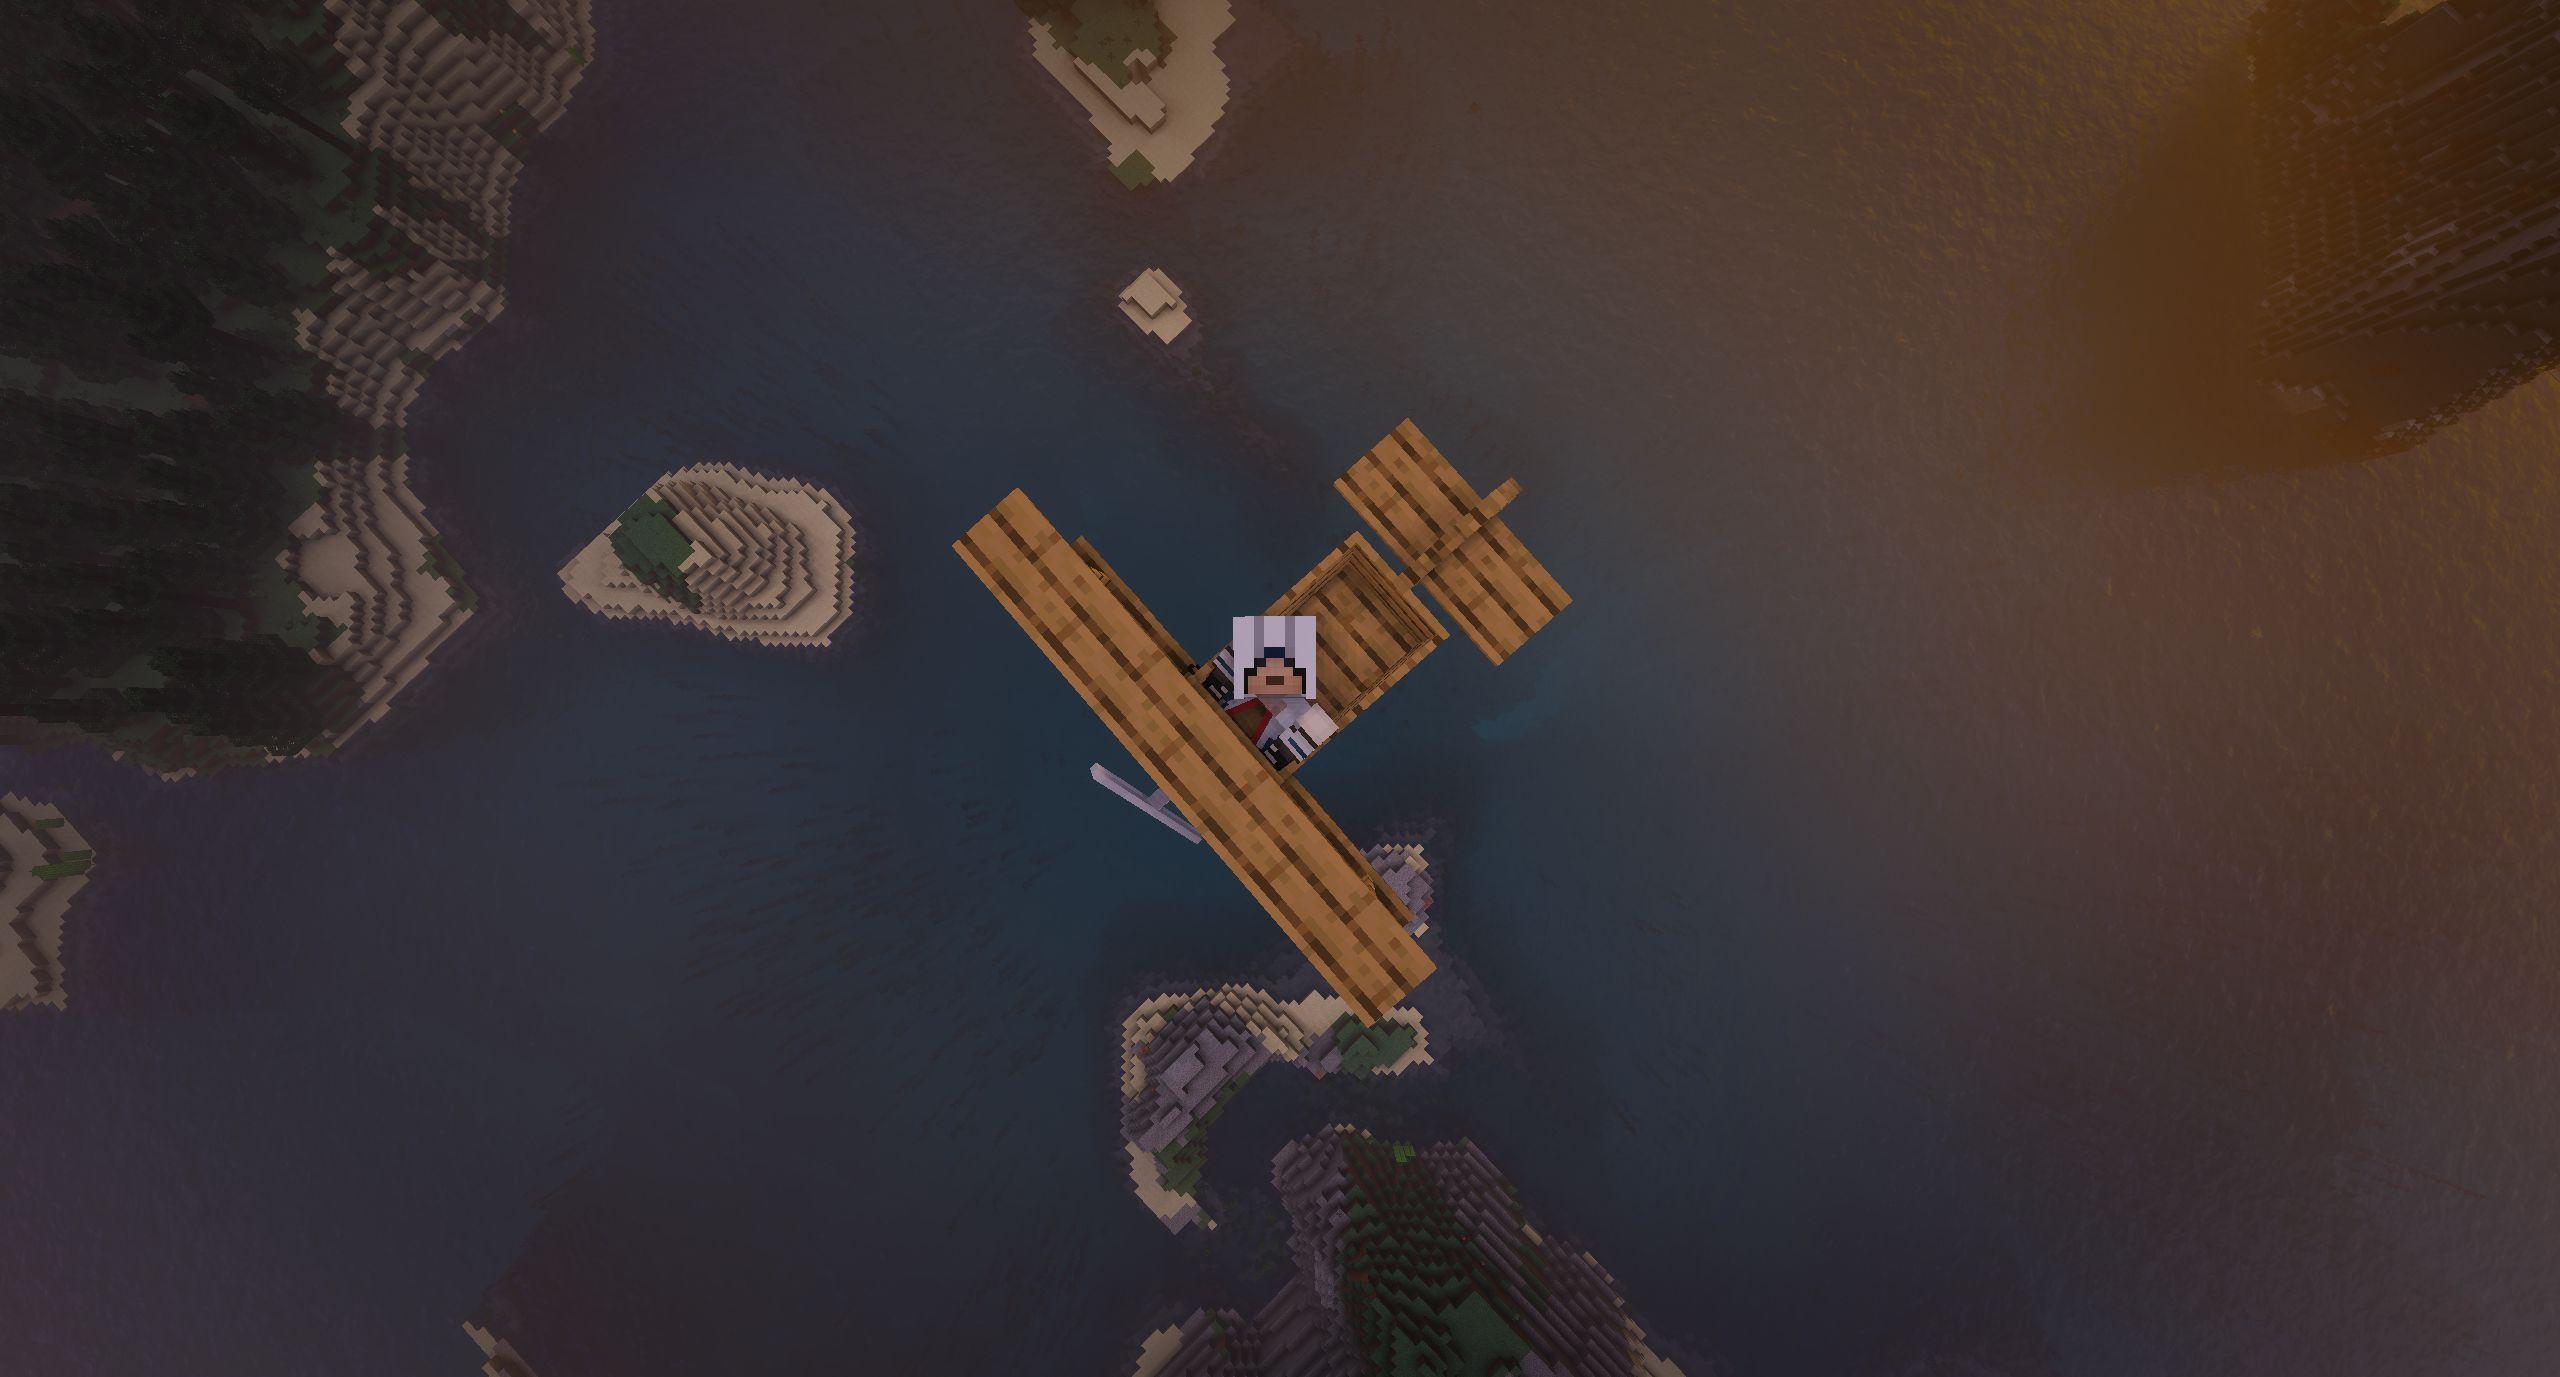 Мод на простой самолёт и вертолёт «Simple Planes» - скриншот 6